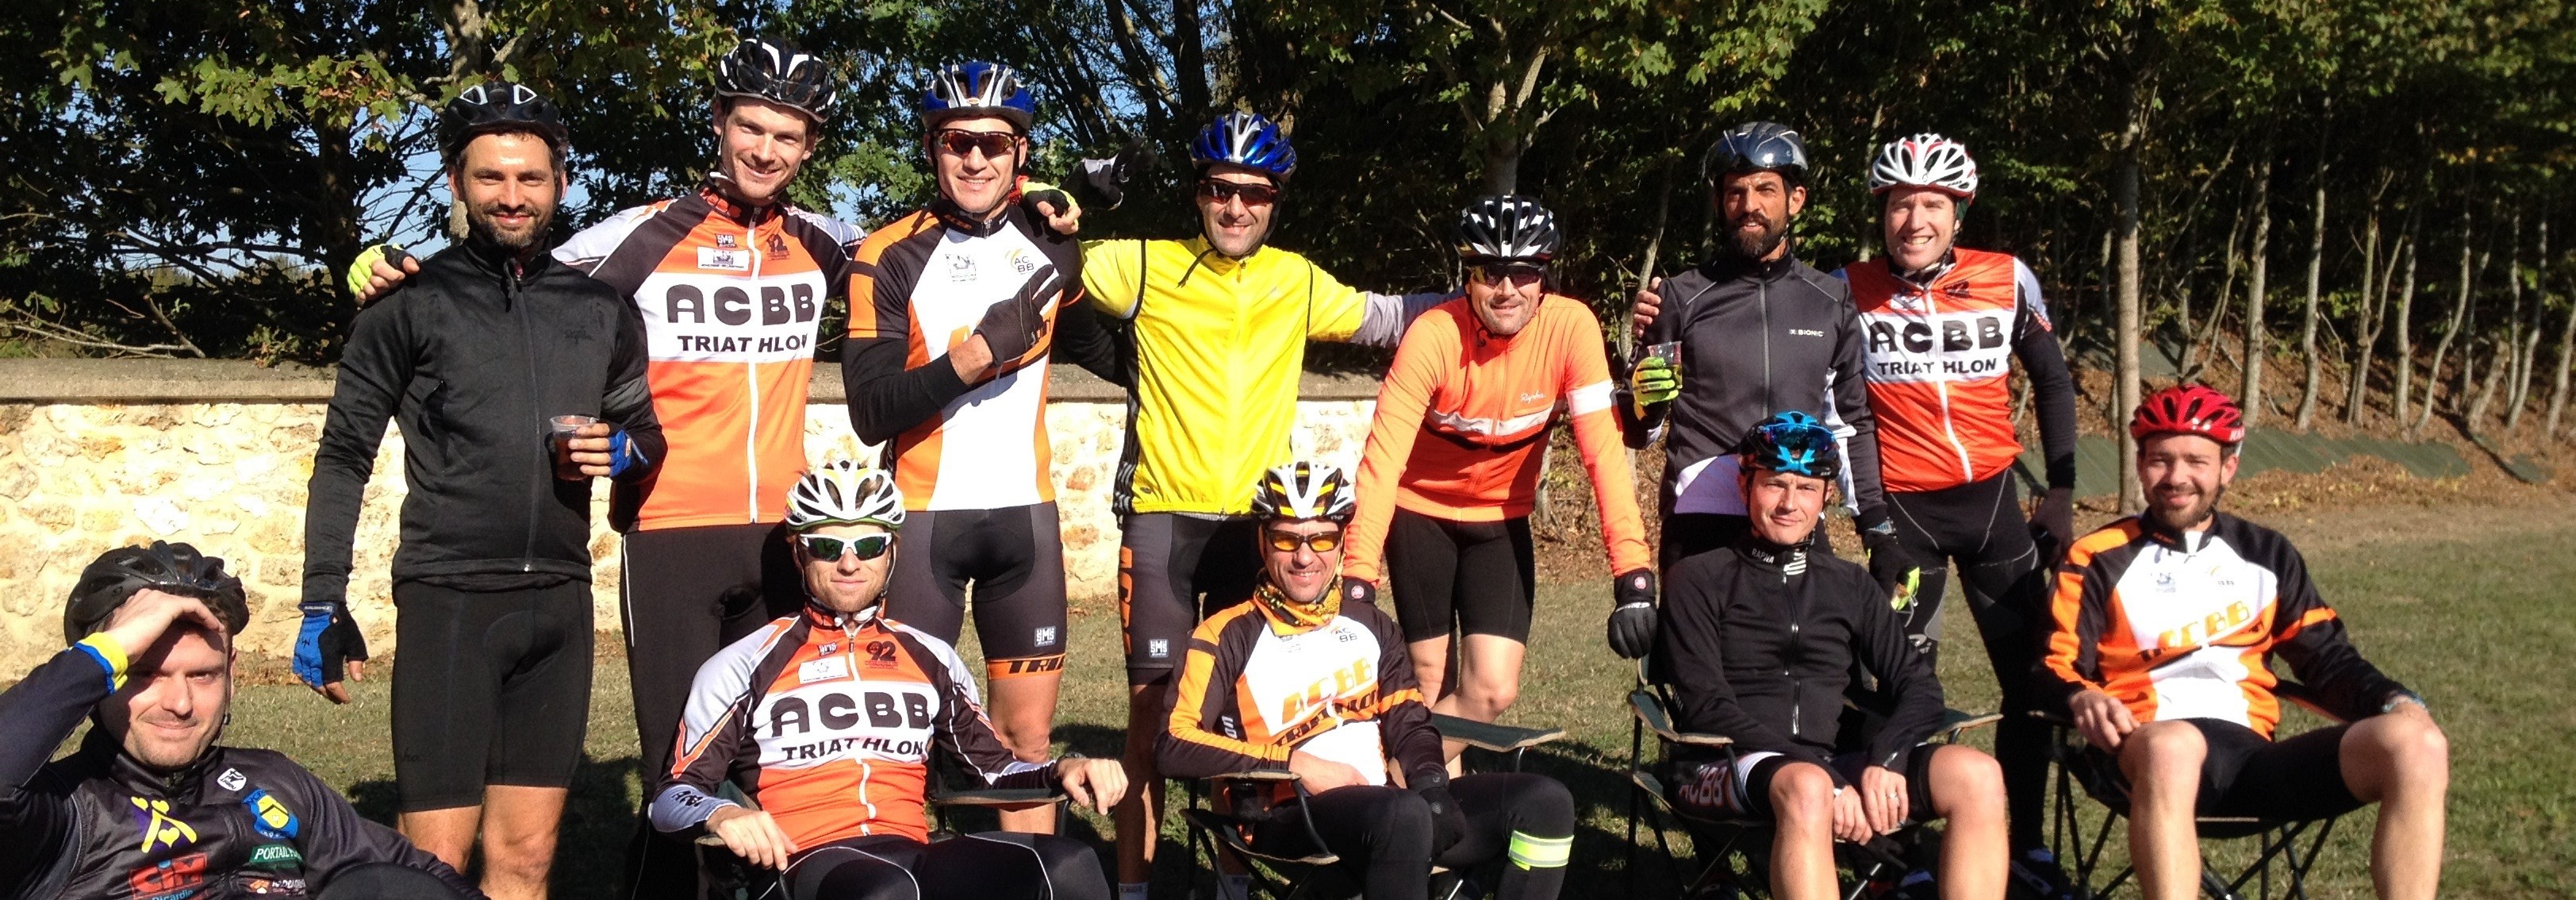 Groupe 1 au ravito de la cyclo Fernand Leroy